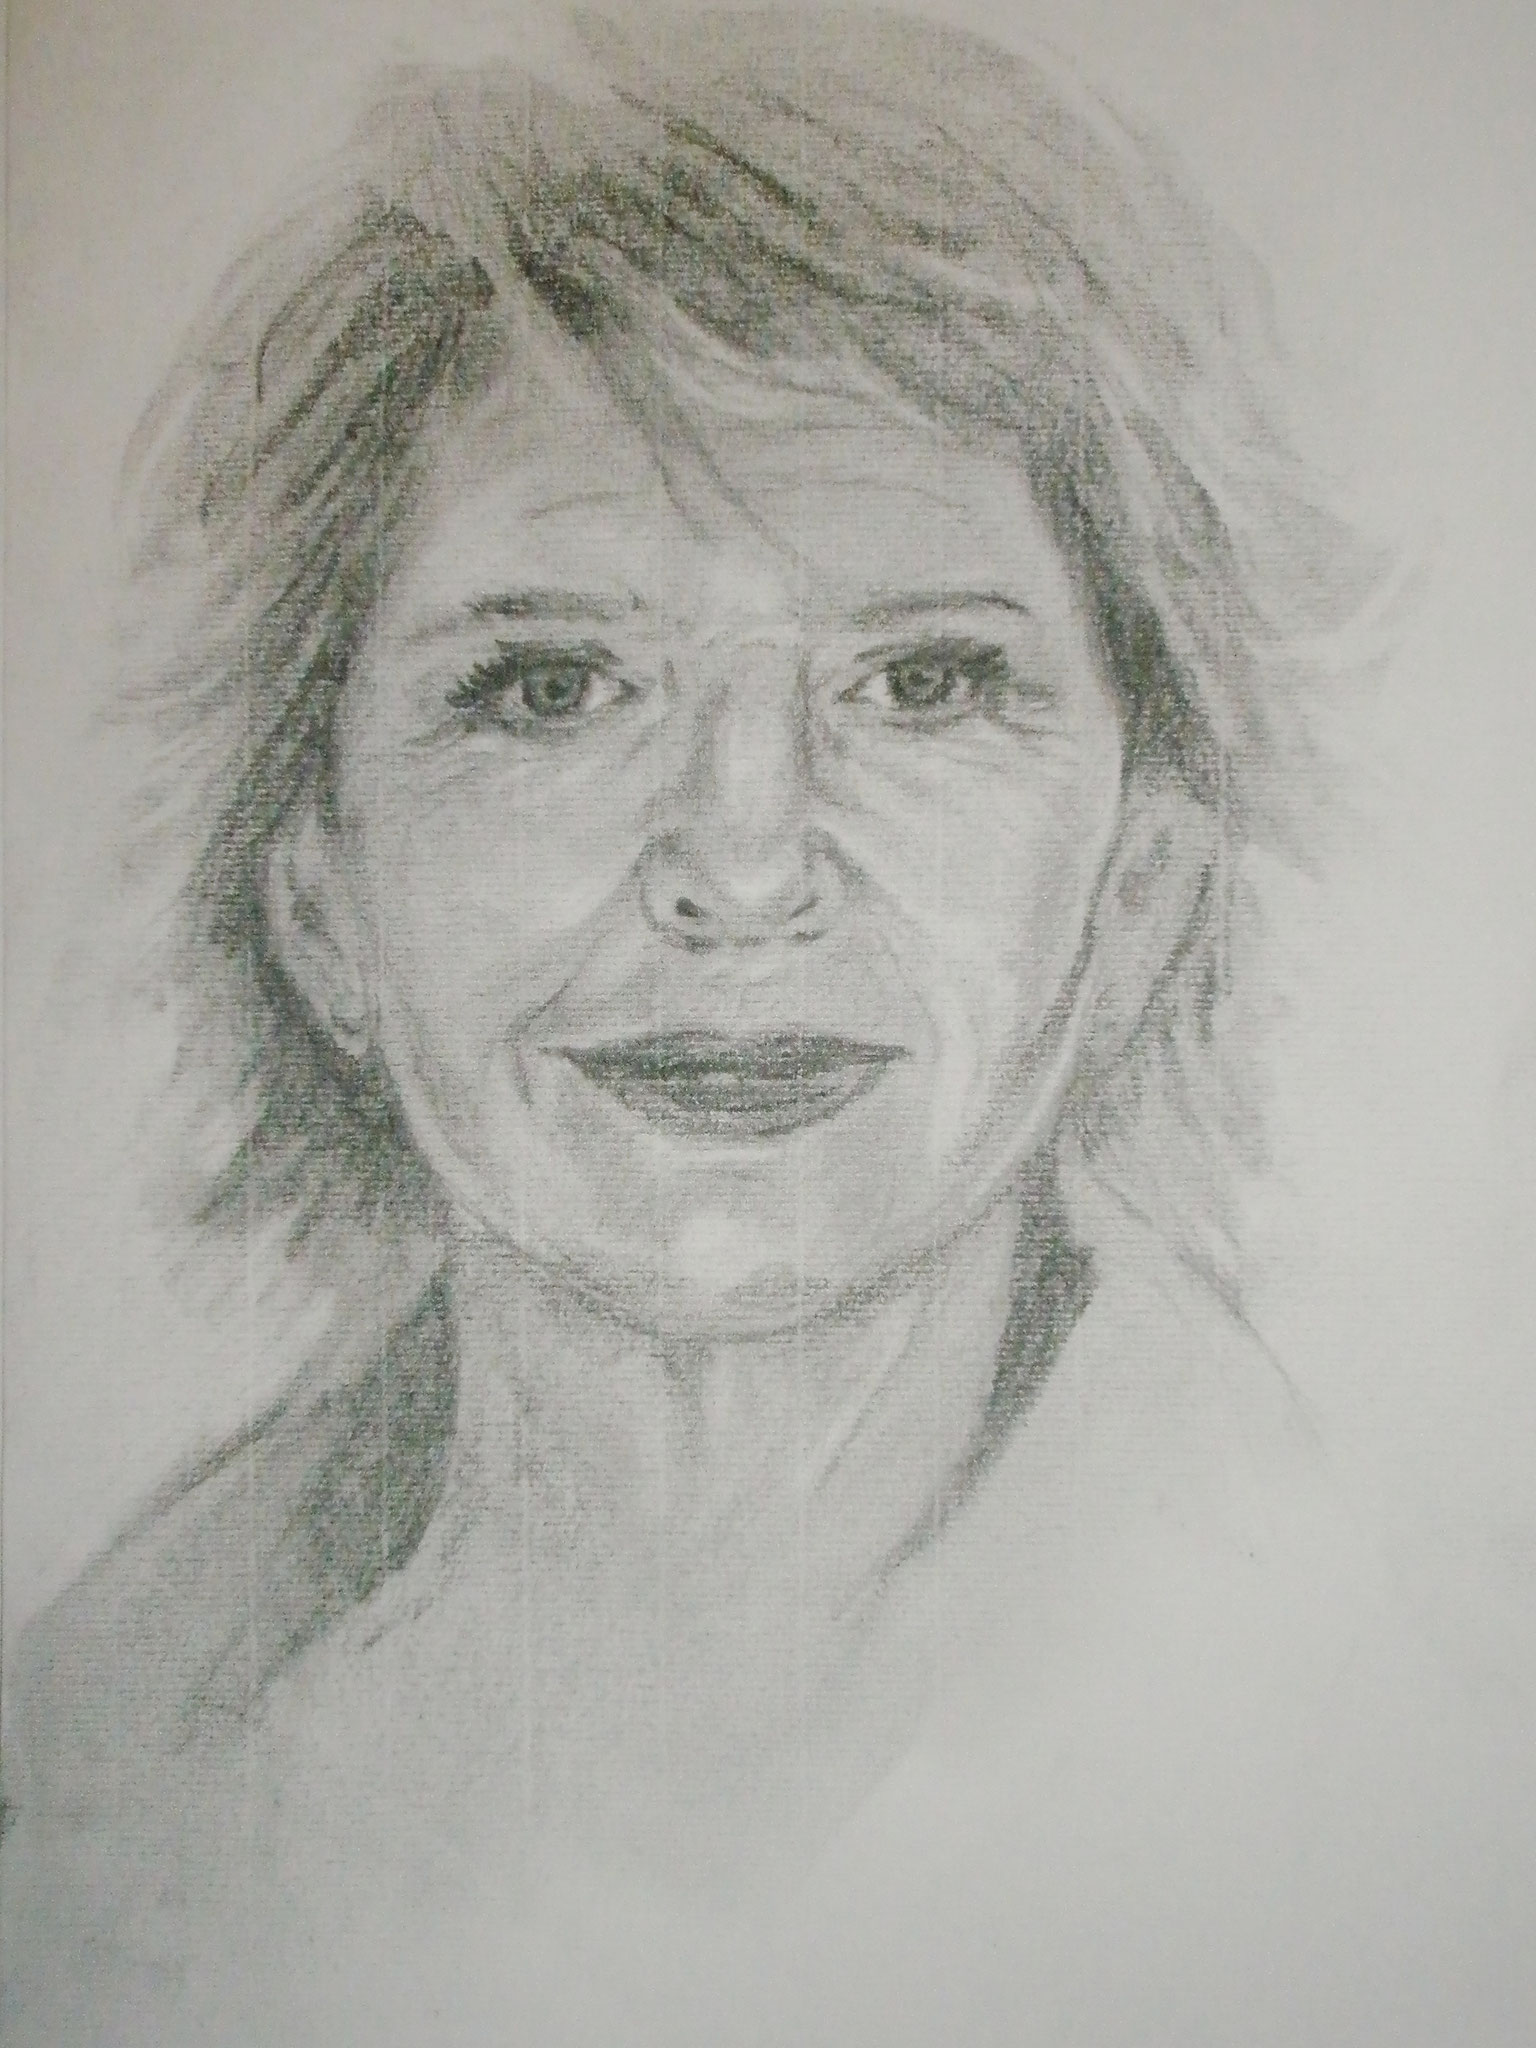 ART HFrei - Christiane Hörbiger - Bleistift